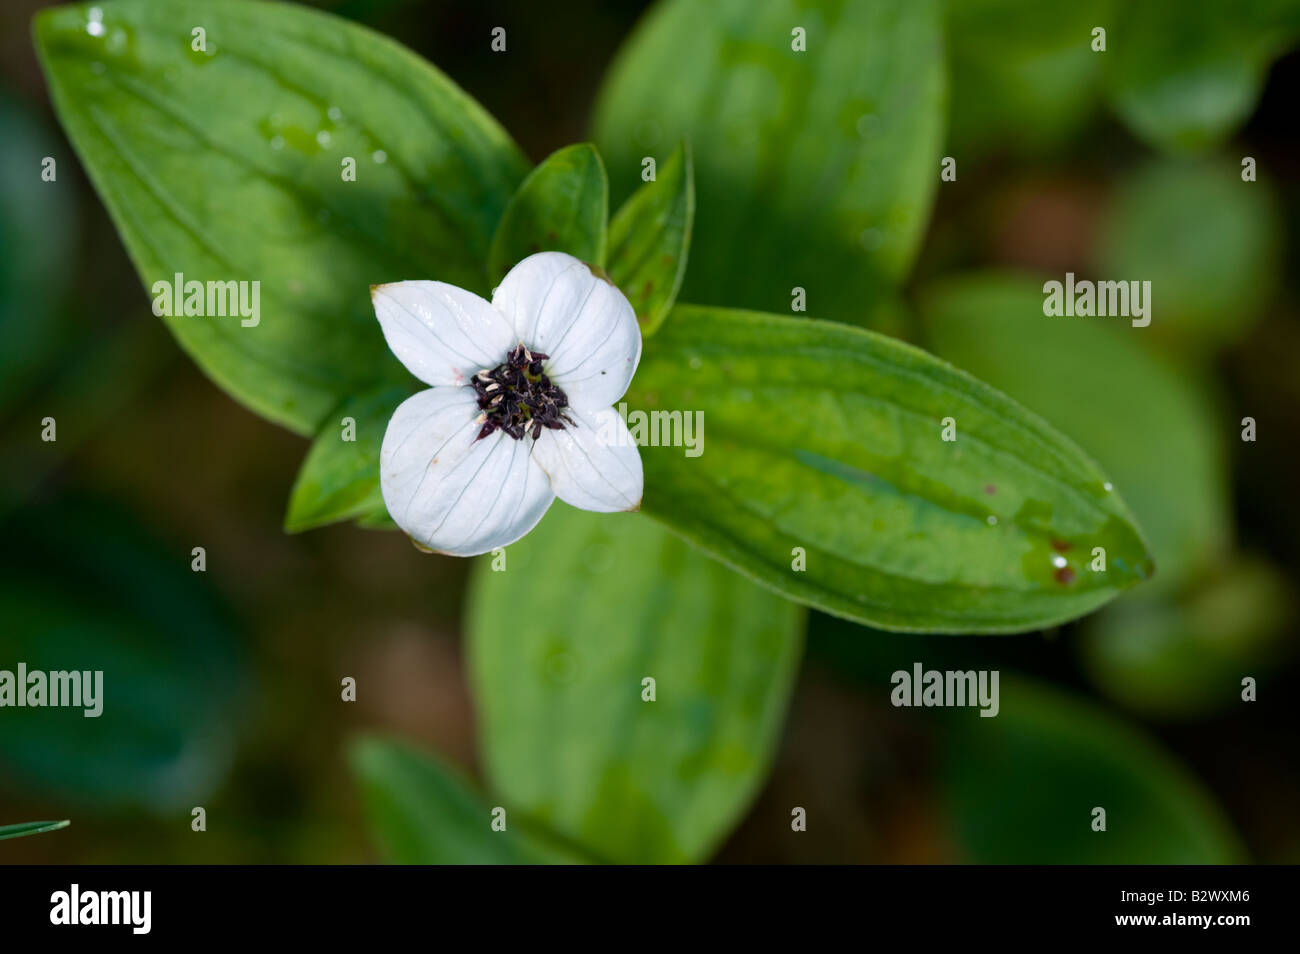 Dwarf Cornel Cornus suecica single flower - Stock Image